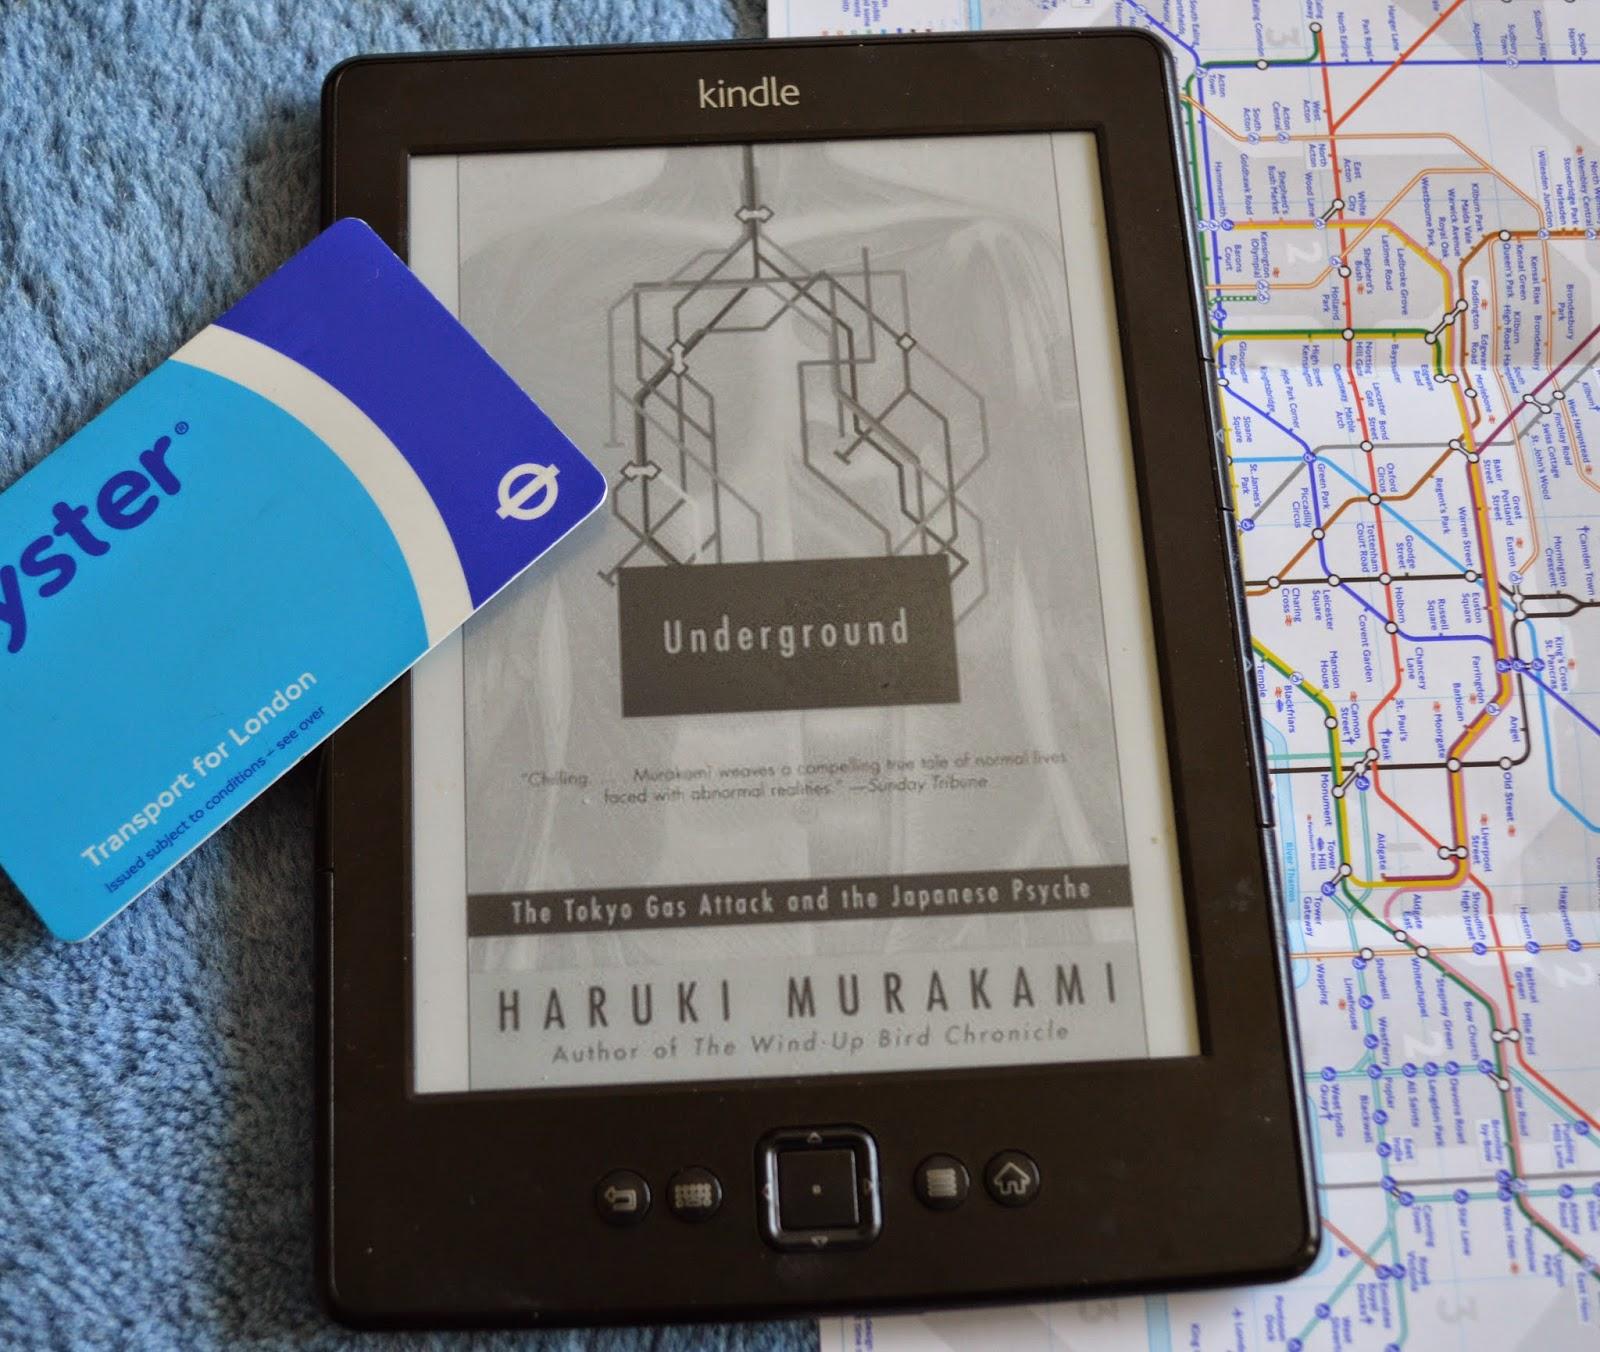 kindle, Haruki Murakami, Underground, Aum Shrinikyo, Tokyo, 1995, subway attack, sarin gas, book review, investigative journalism, non-fiction, personal response